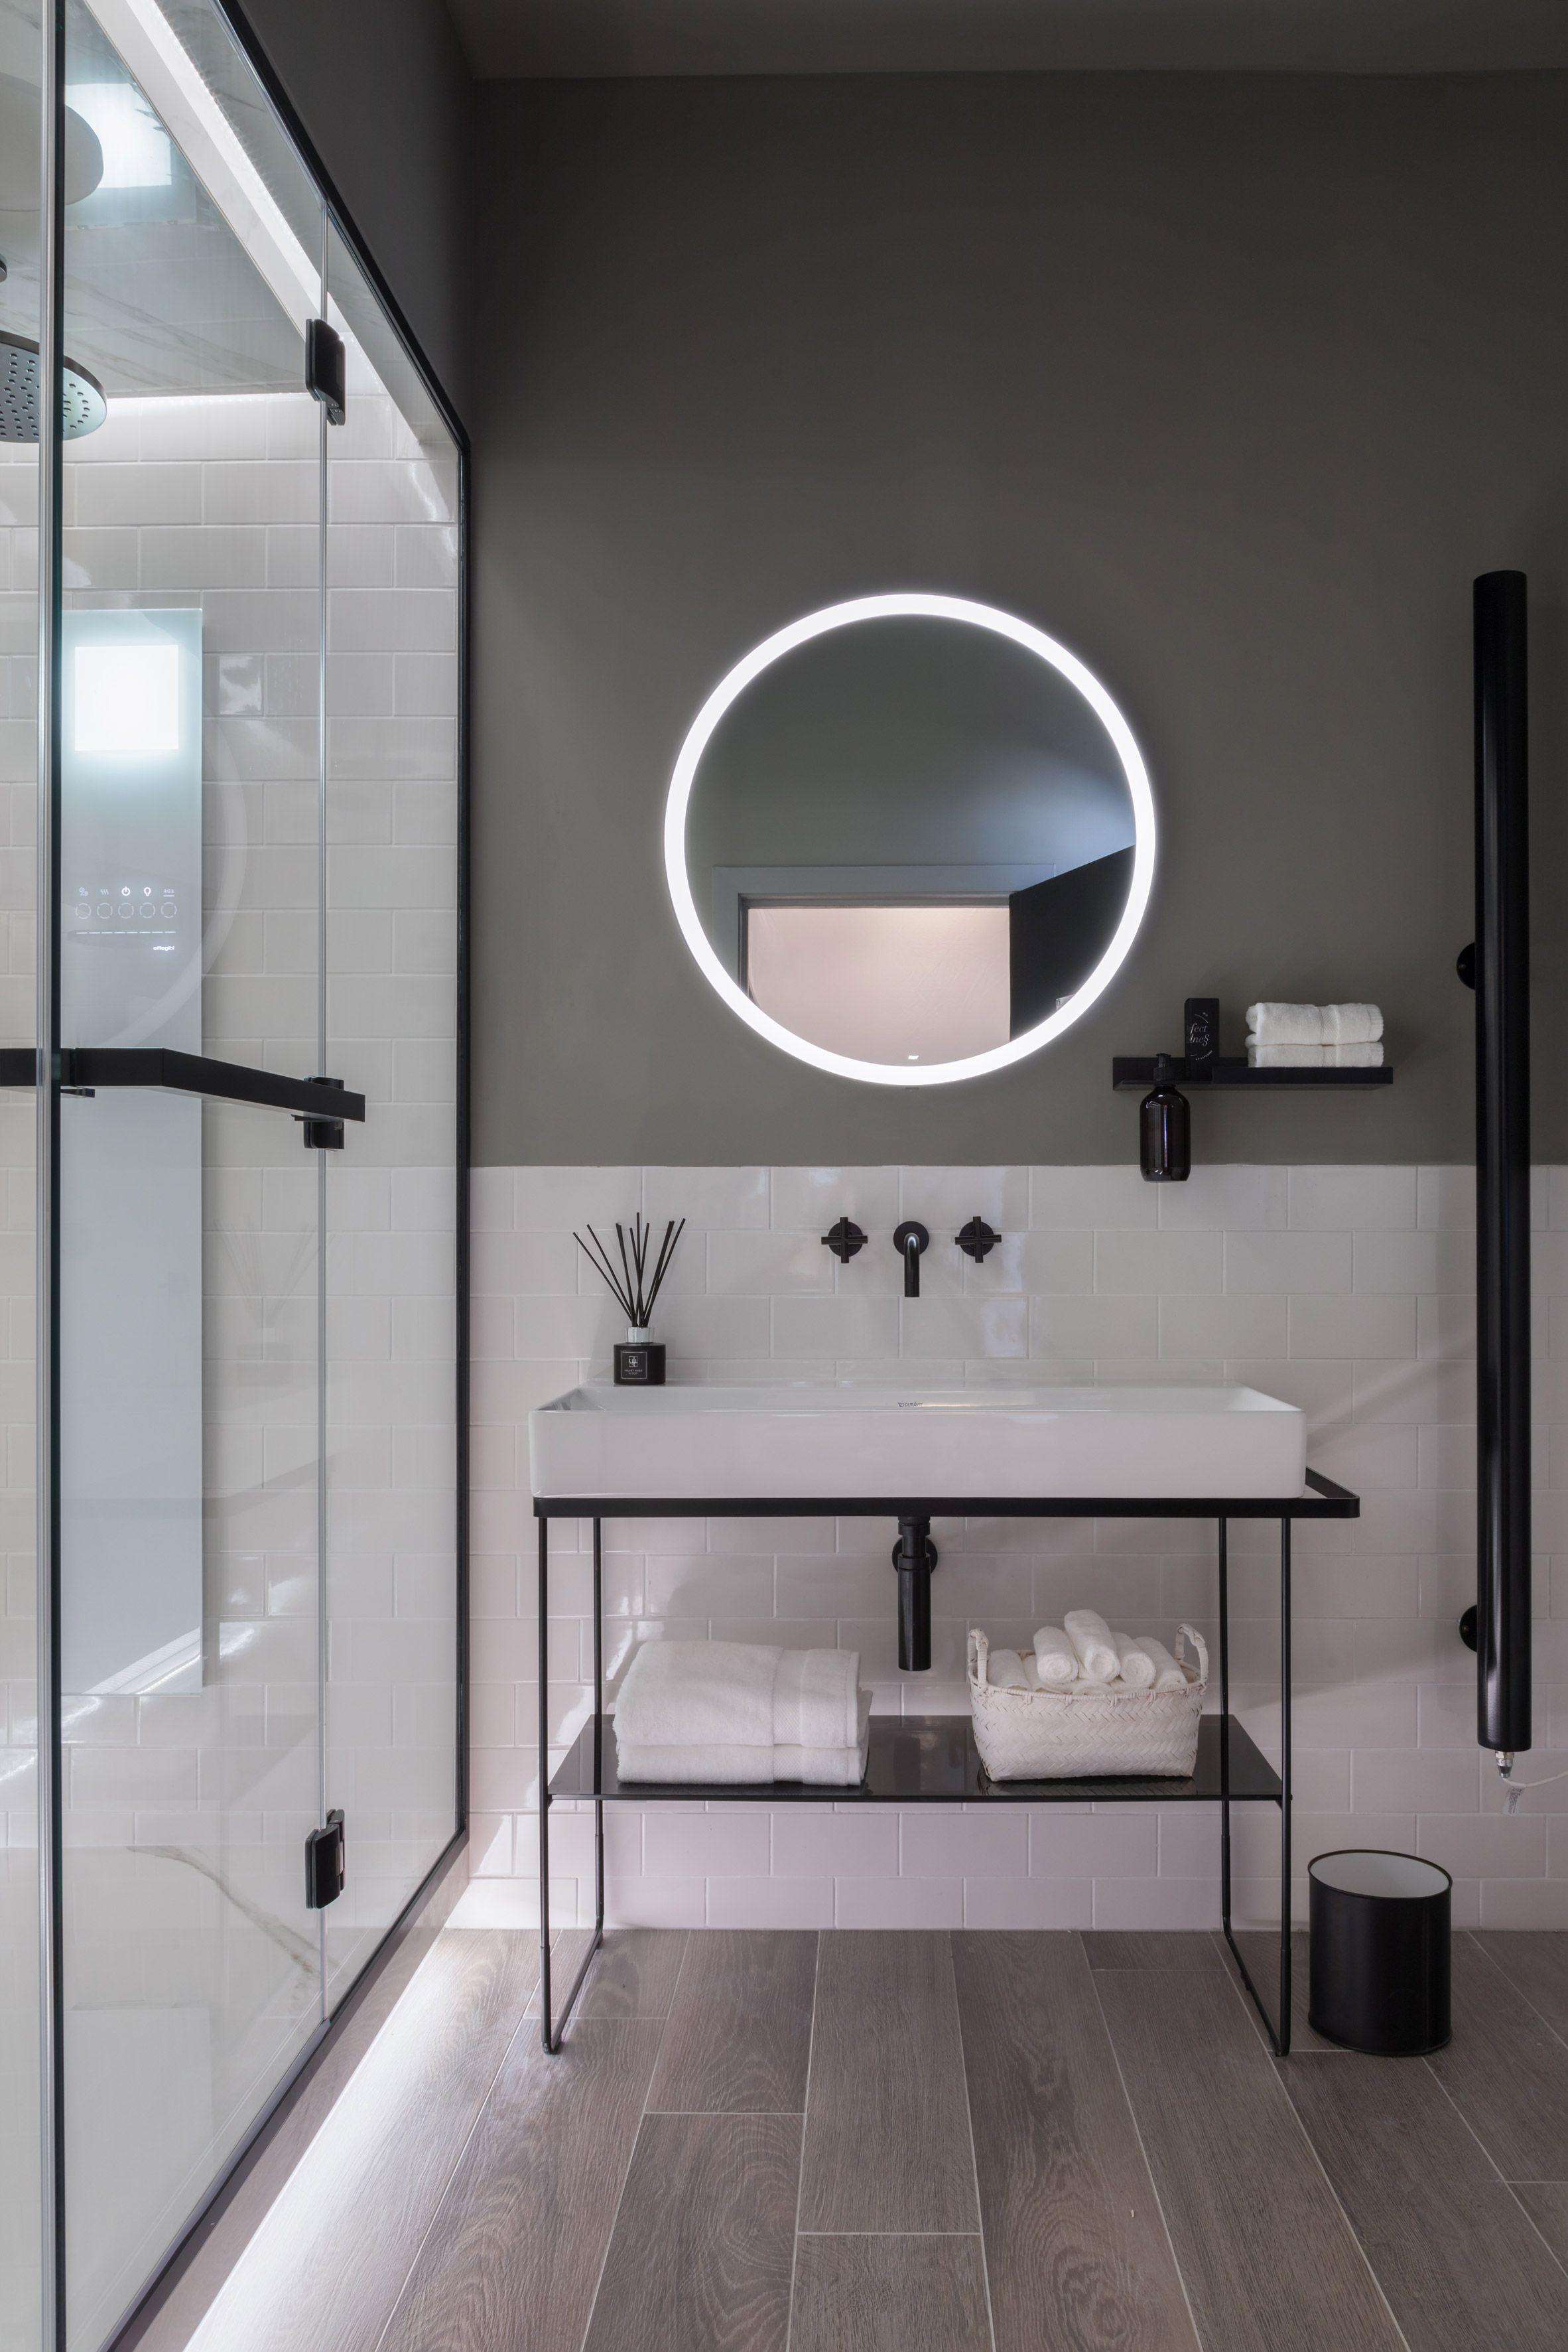 A Horizontal Shower Replaces The Bathtub In German Bathroom Brand Dornbracht S Futuristic Six Sq Bathroom Interior Bathroom Interior Design Spa Bathroom Design